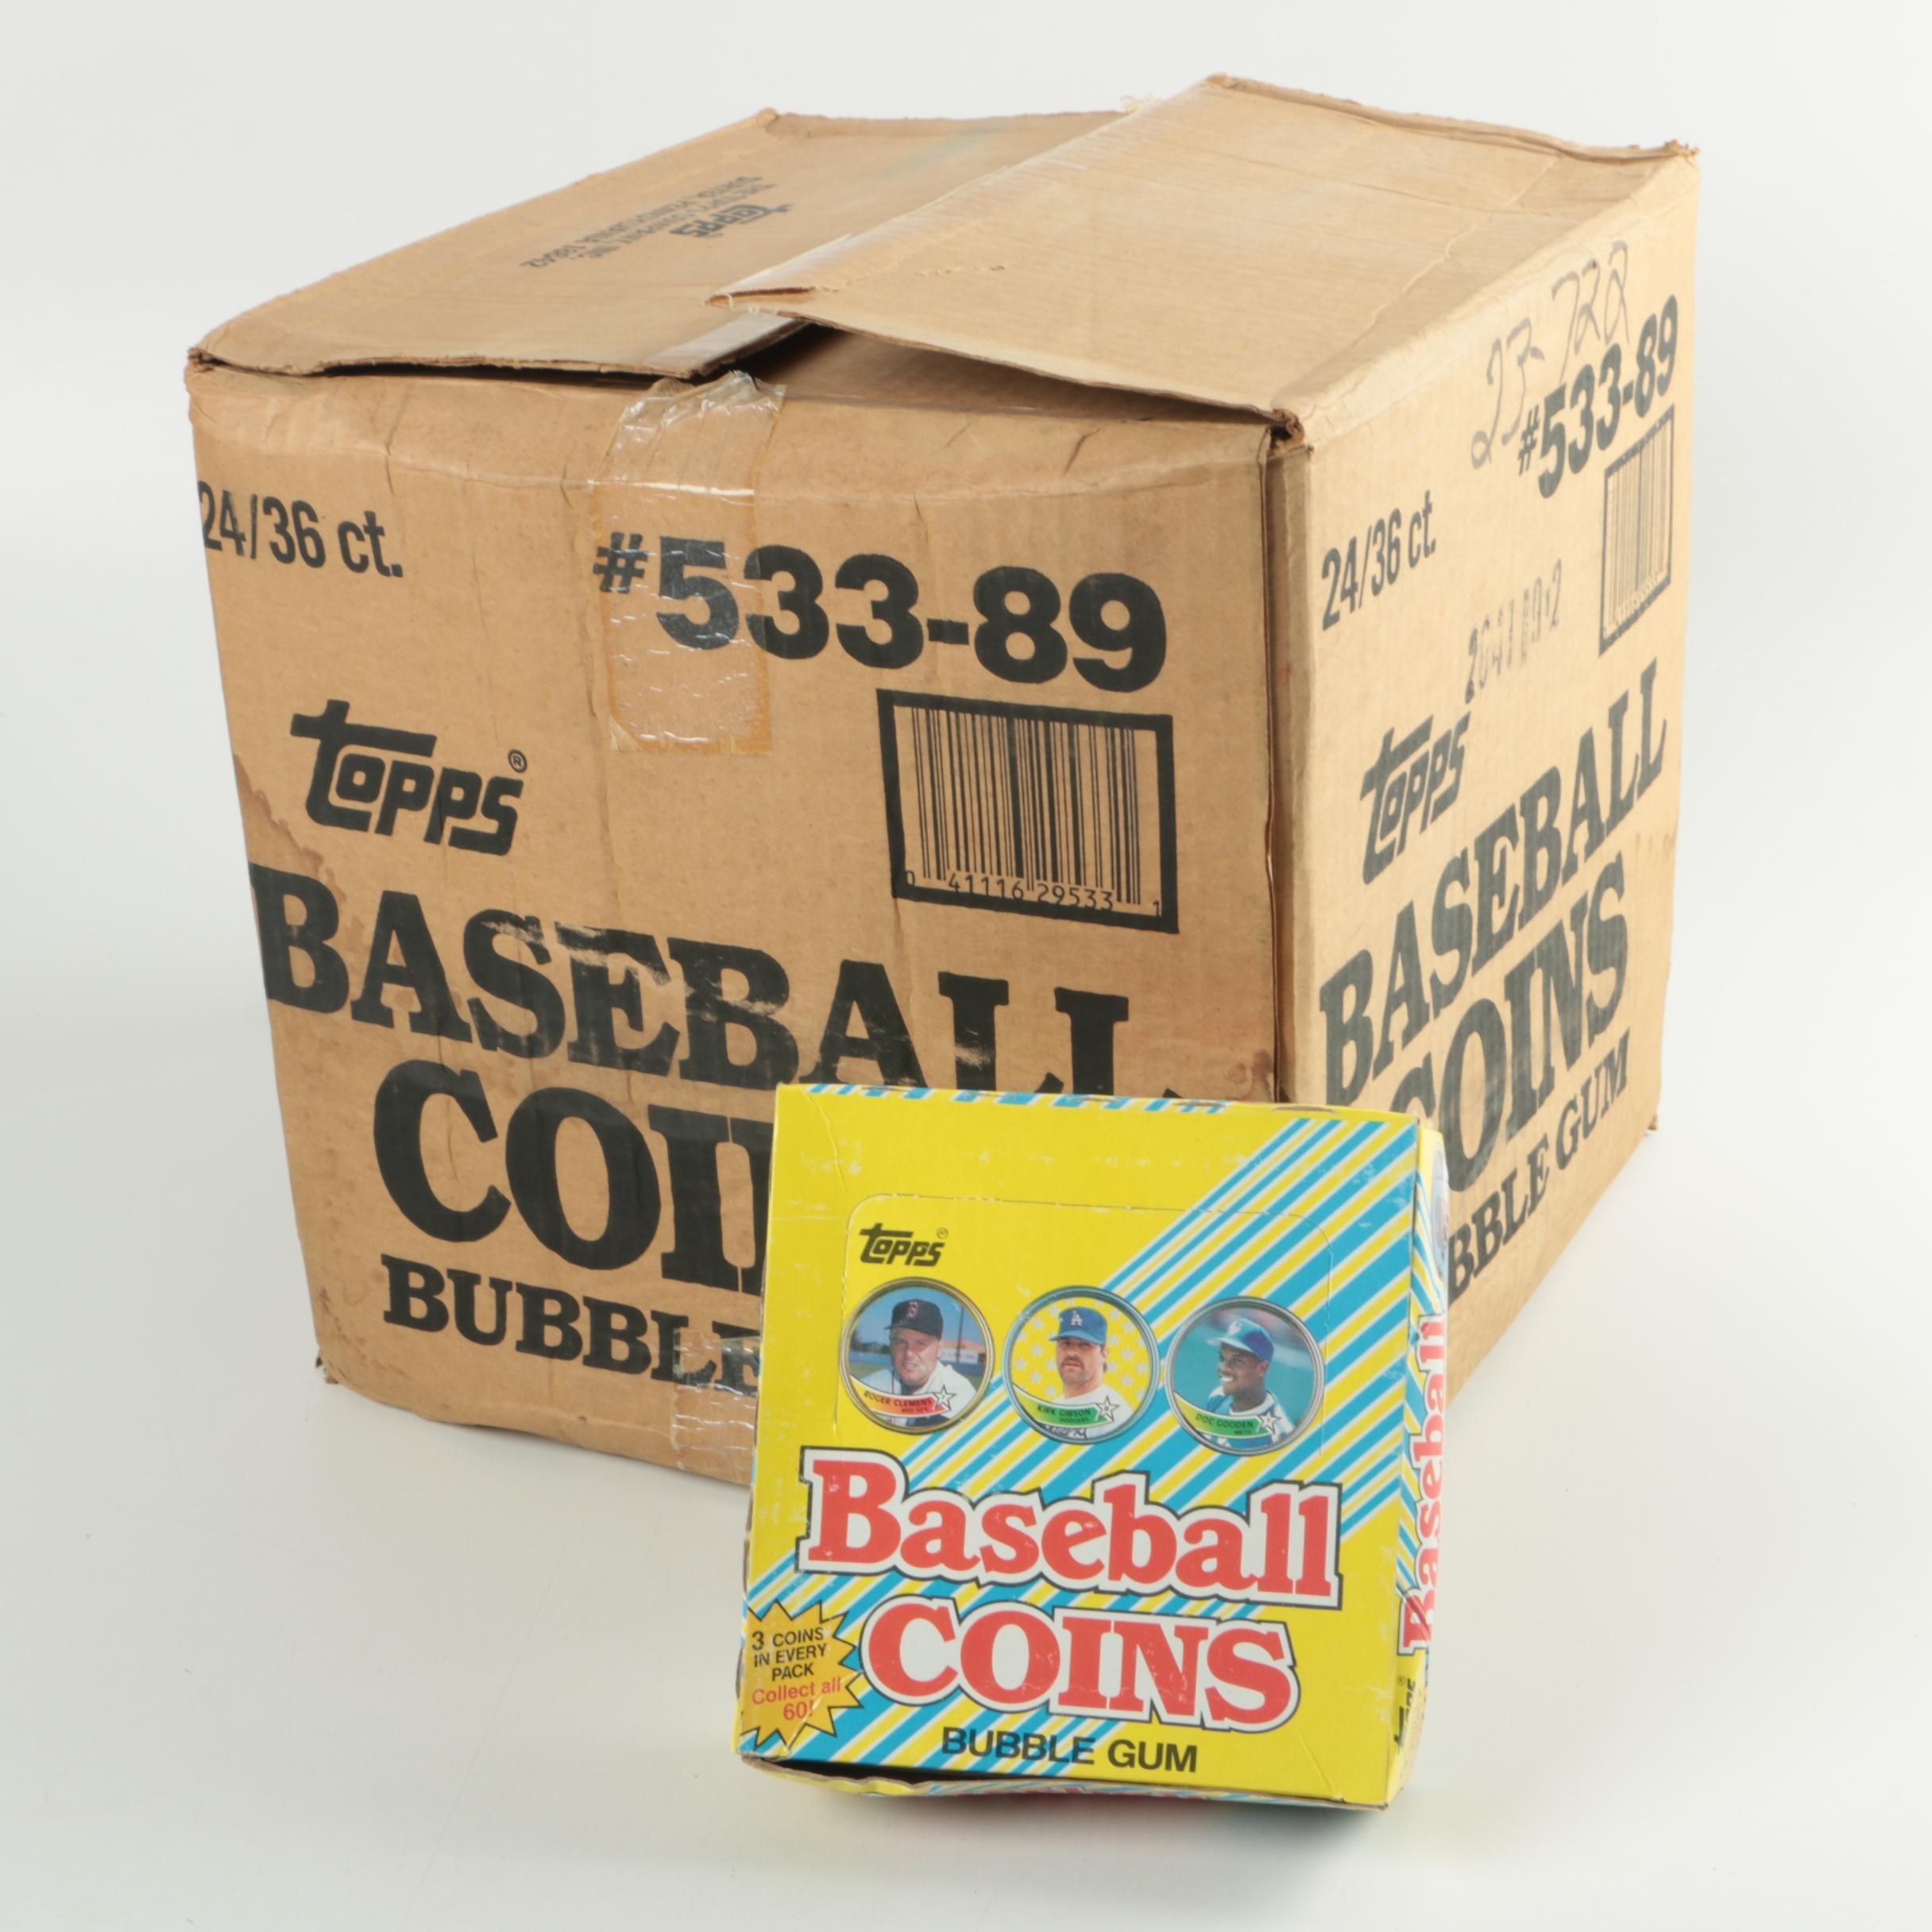 1989 Topps Bubble Gum Baseball Coin Sets